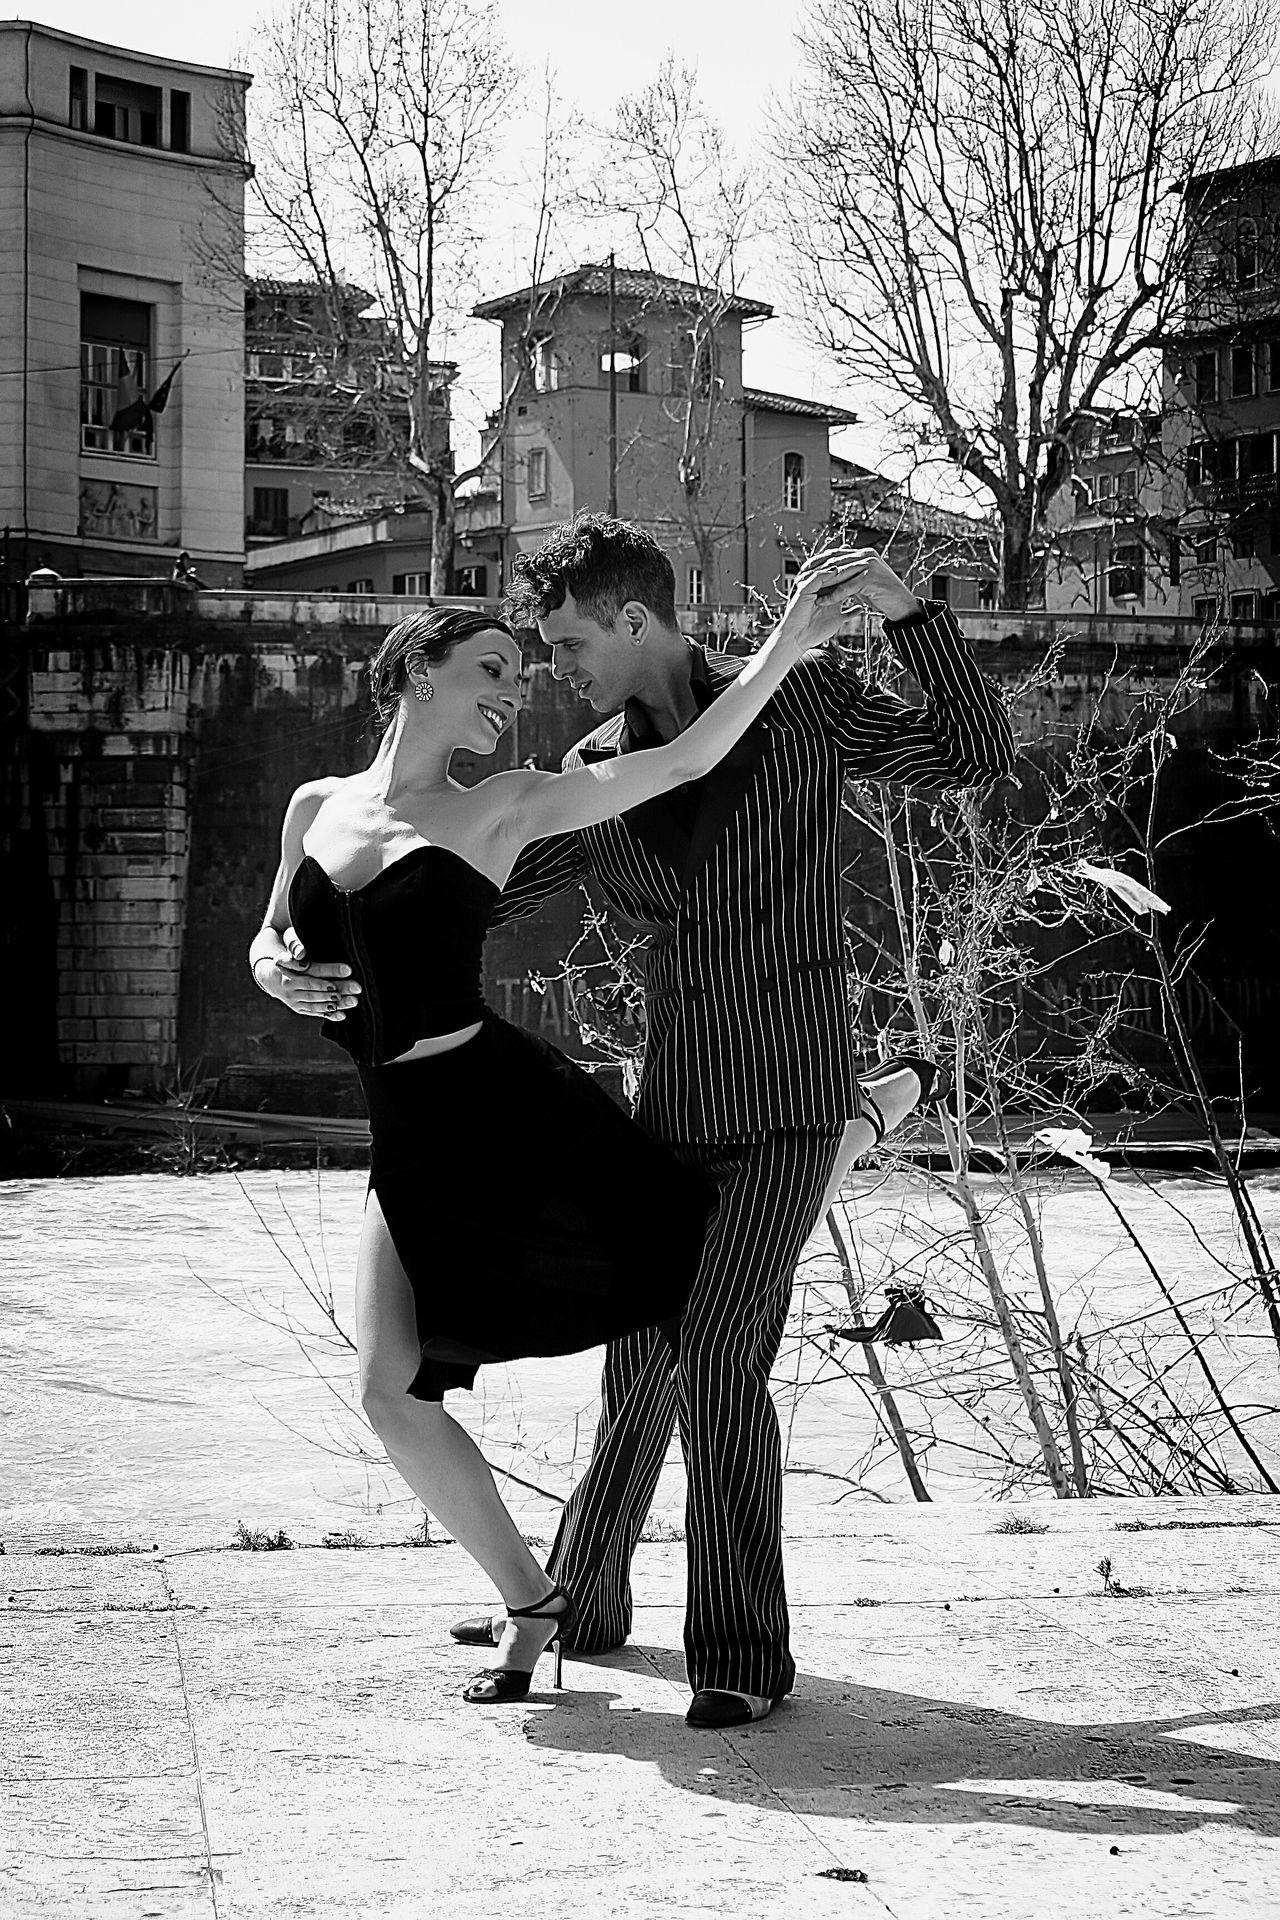 Black&white Blackandwhite Blackandwhite Photography Black And White Black & White Dance Photography Dance Tango Life Tango